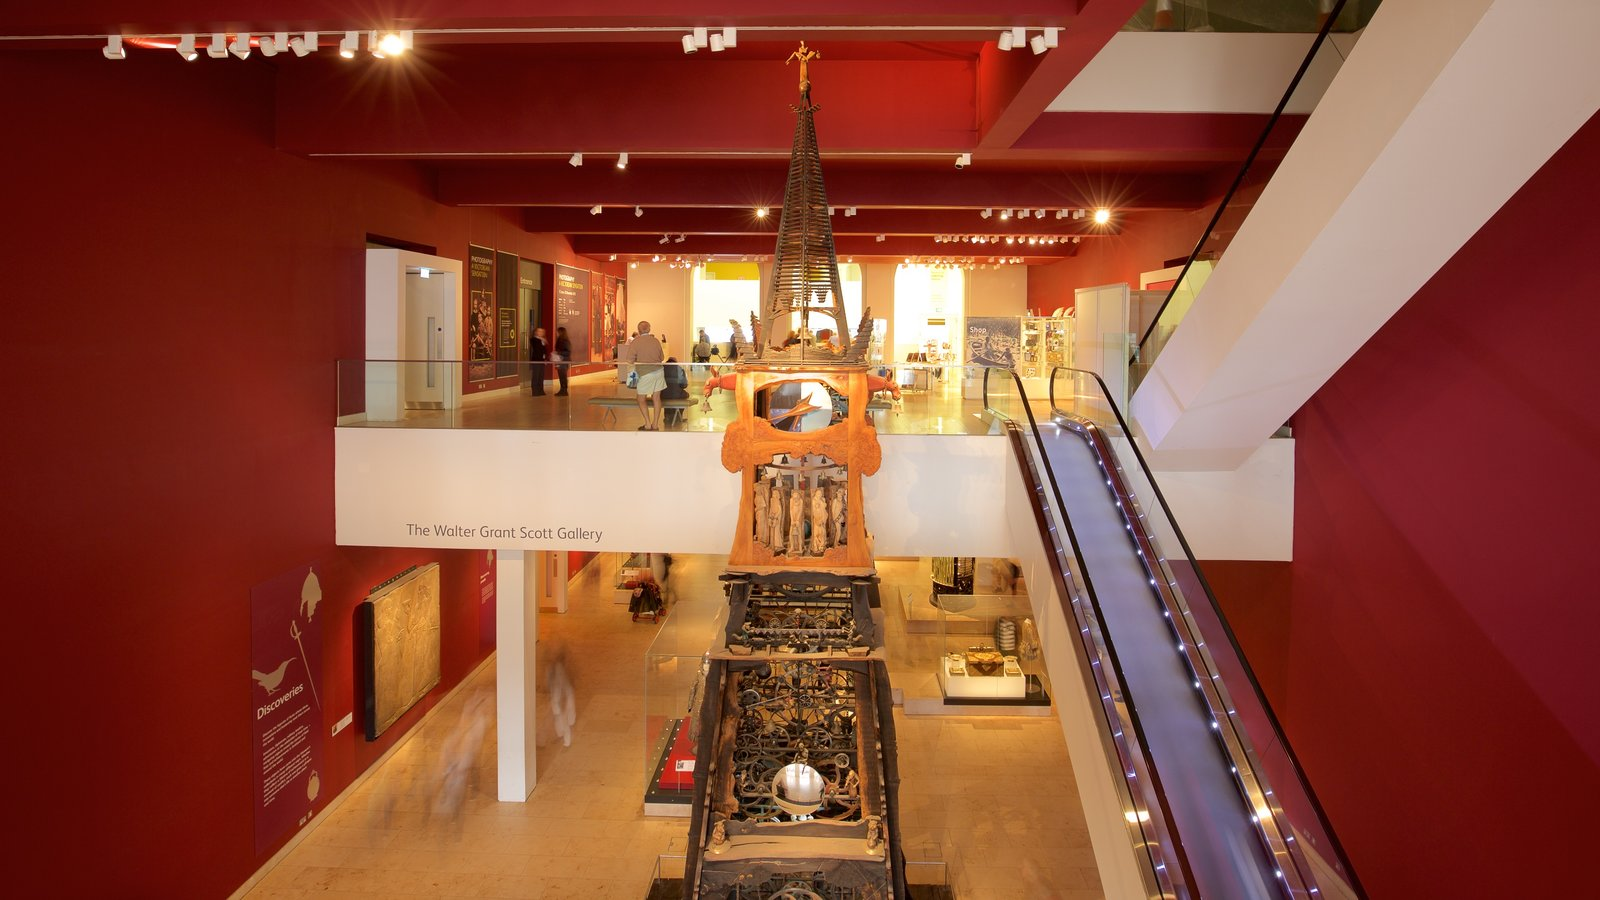 National Museum of Scotland featuring interior views